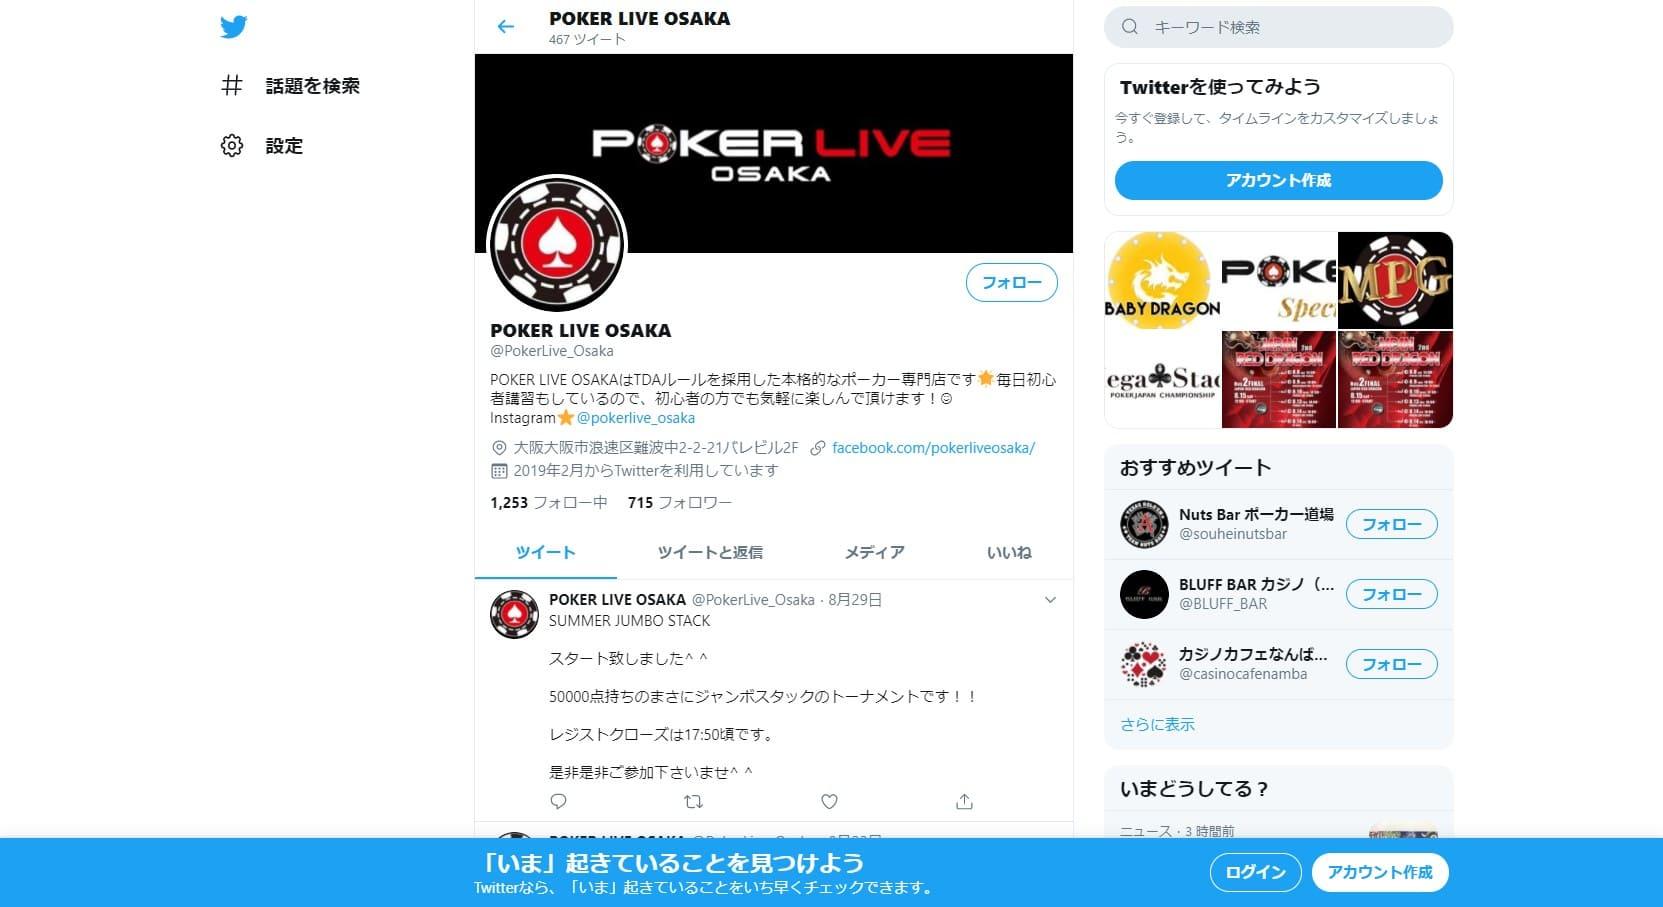 POKER LIVE OSAKAのツイッター。